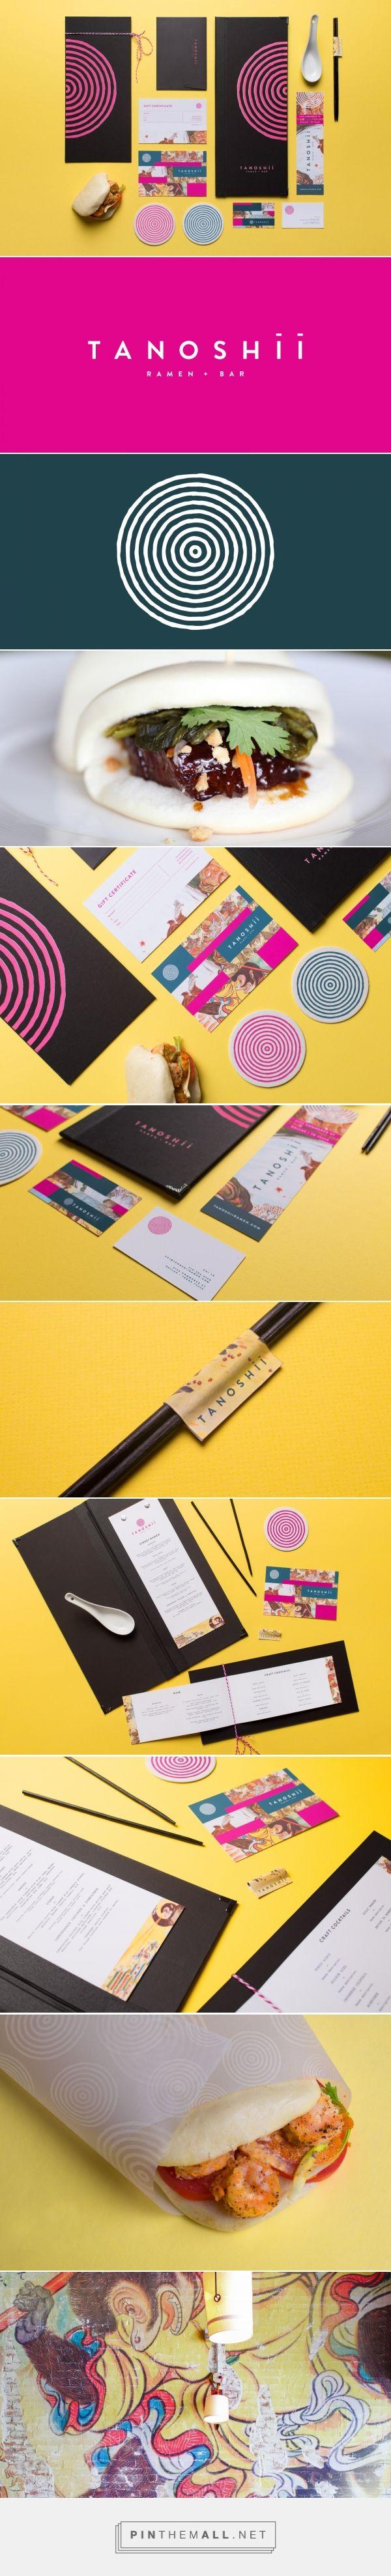 Tanoshii Ramen Restaurant Branding by Mast | Fivestar Branding – Design and…